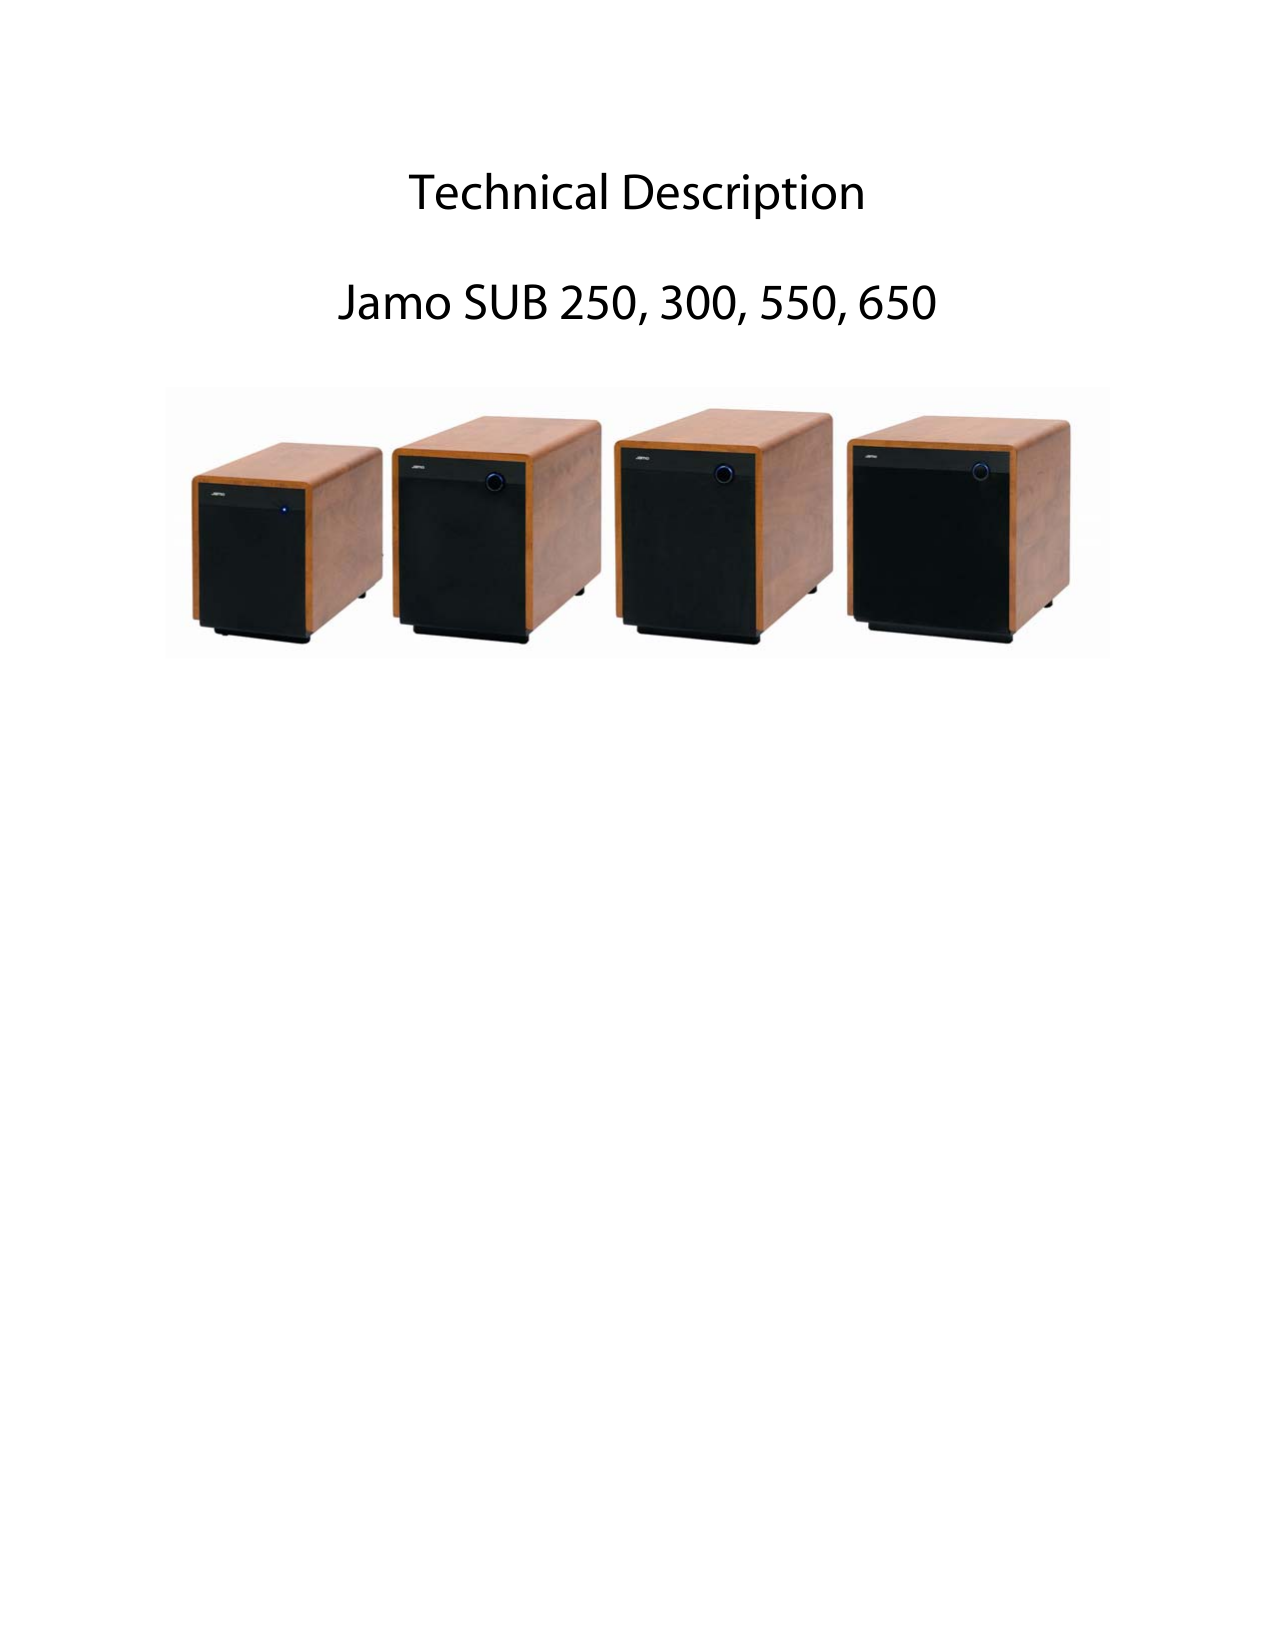 pdf for Jamo Subwoofer SUB 650 manual